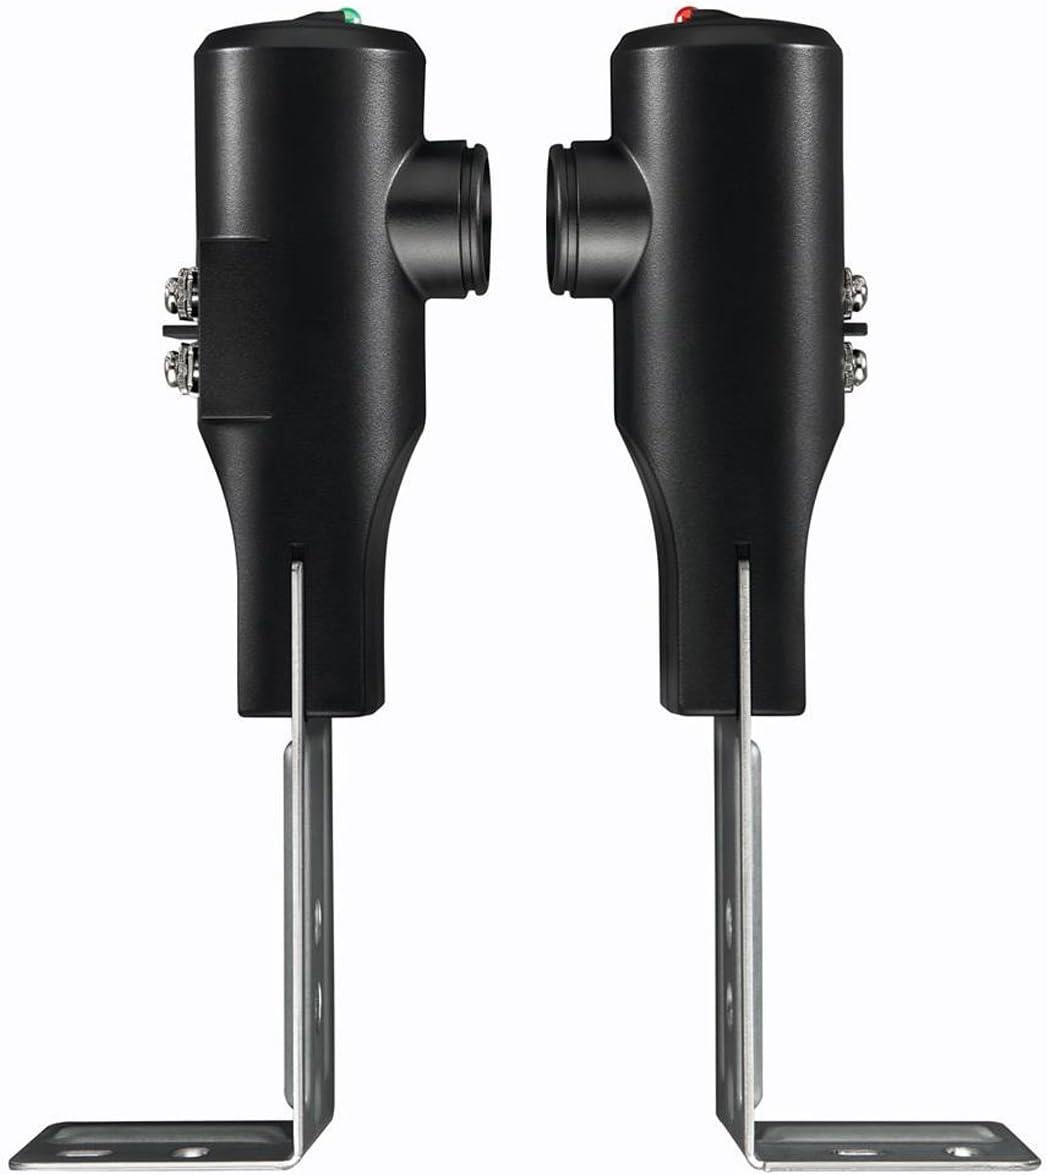 2 Pack Black GSTB-R Fivе Расk Black one size Genie GSTB-R STB-BL Replacement Safety Beams